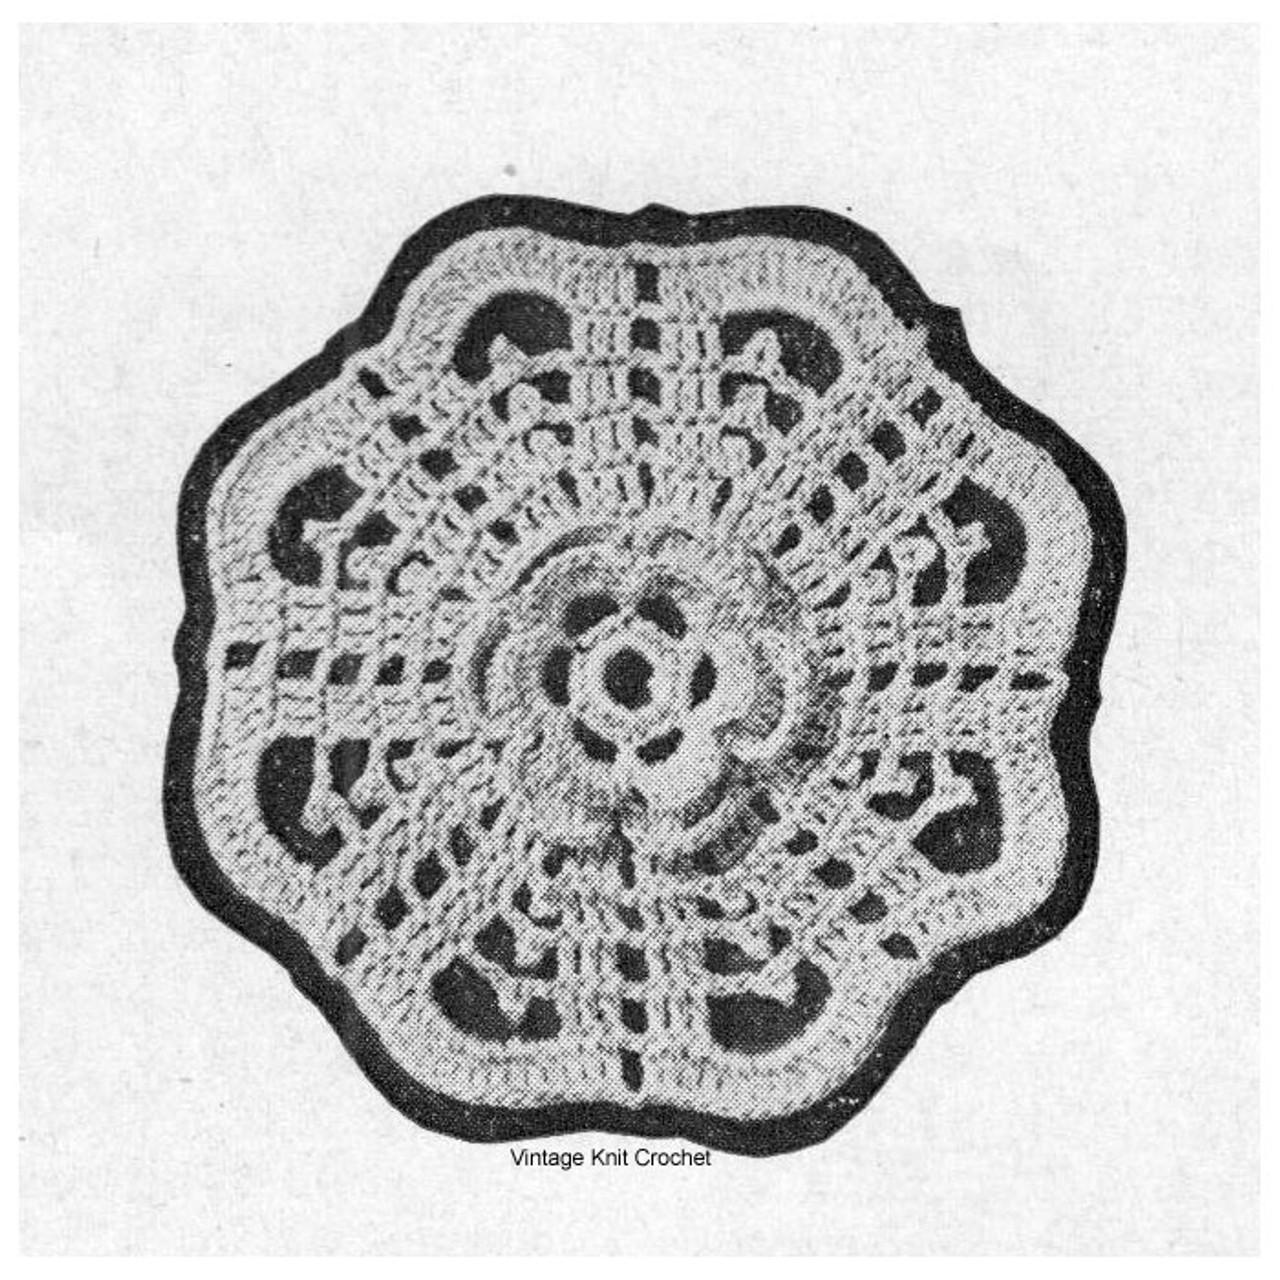 Talisman Crochet Medallion is 3-1/4 inches